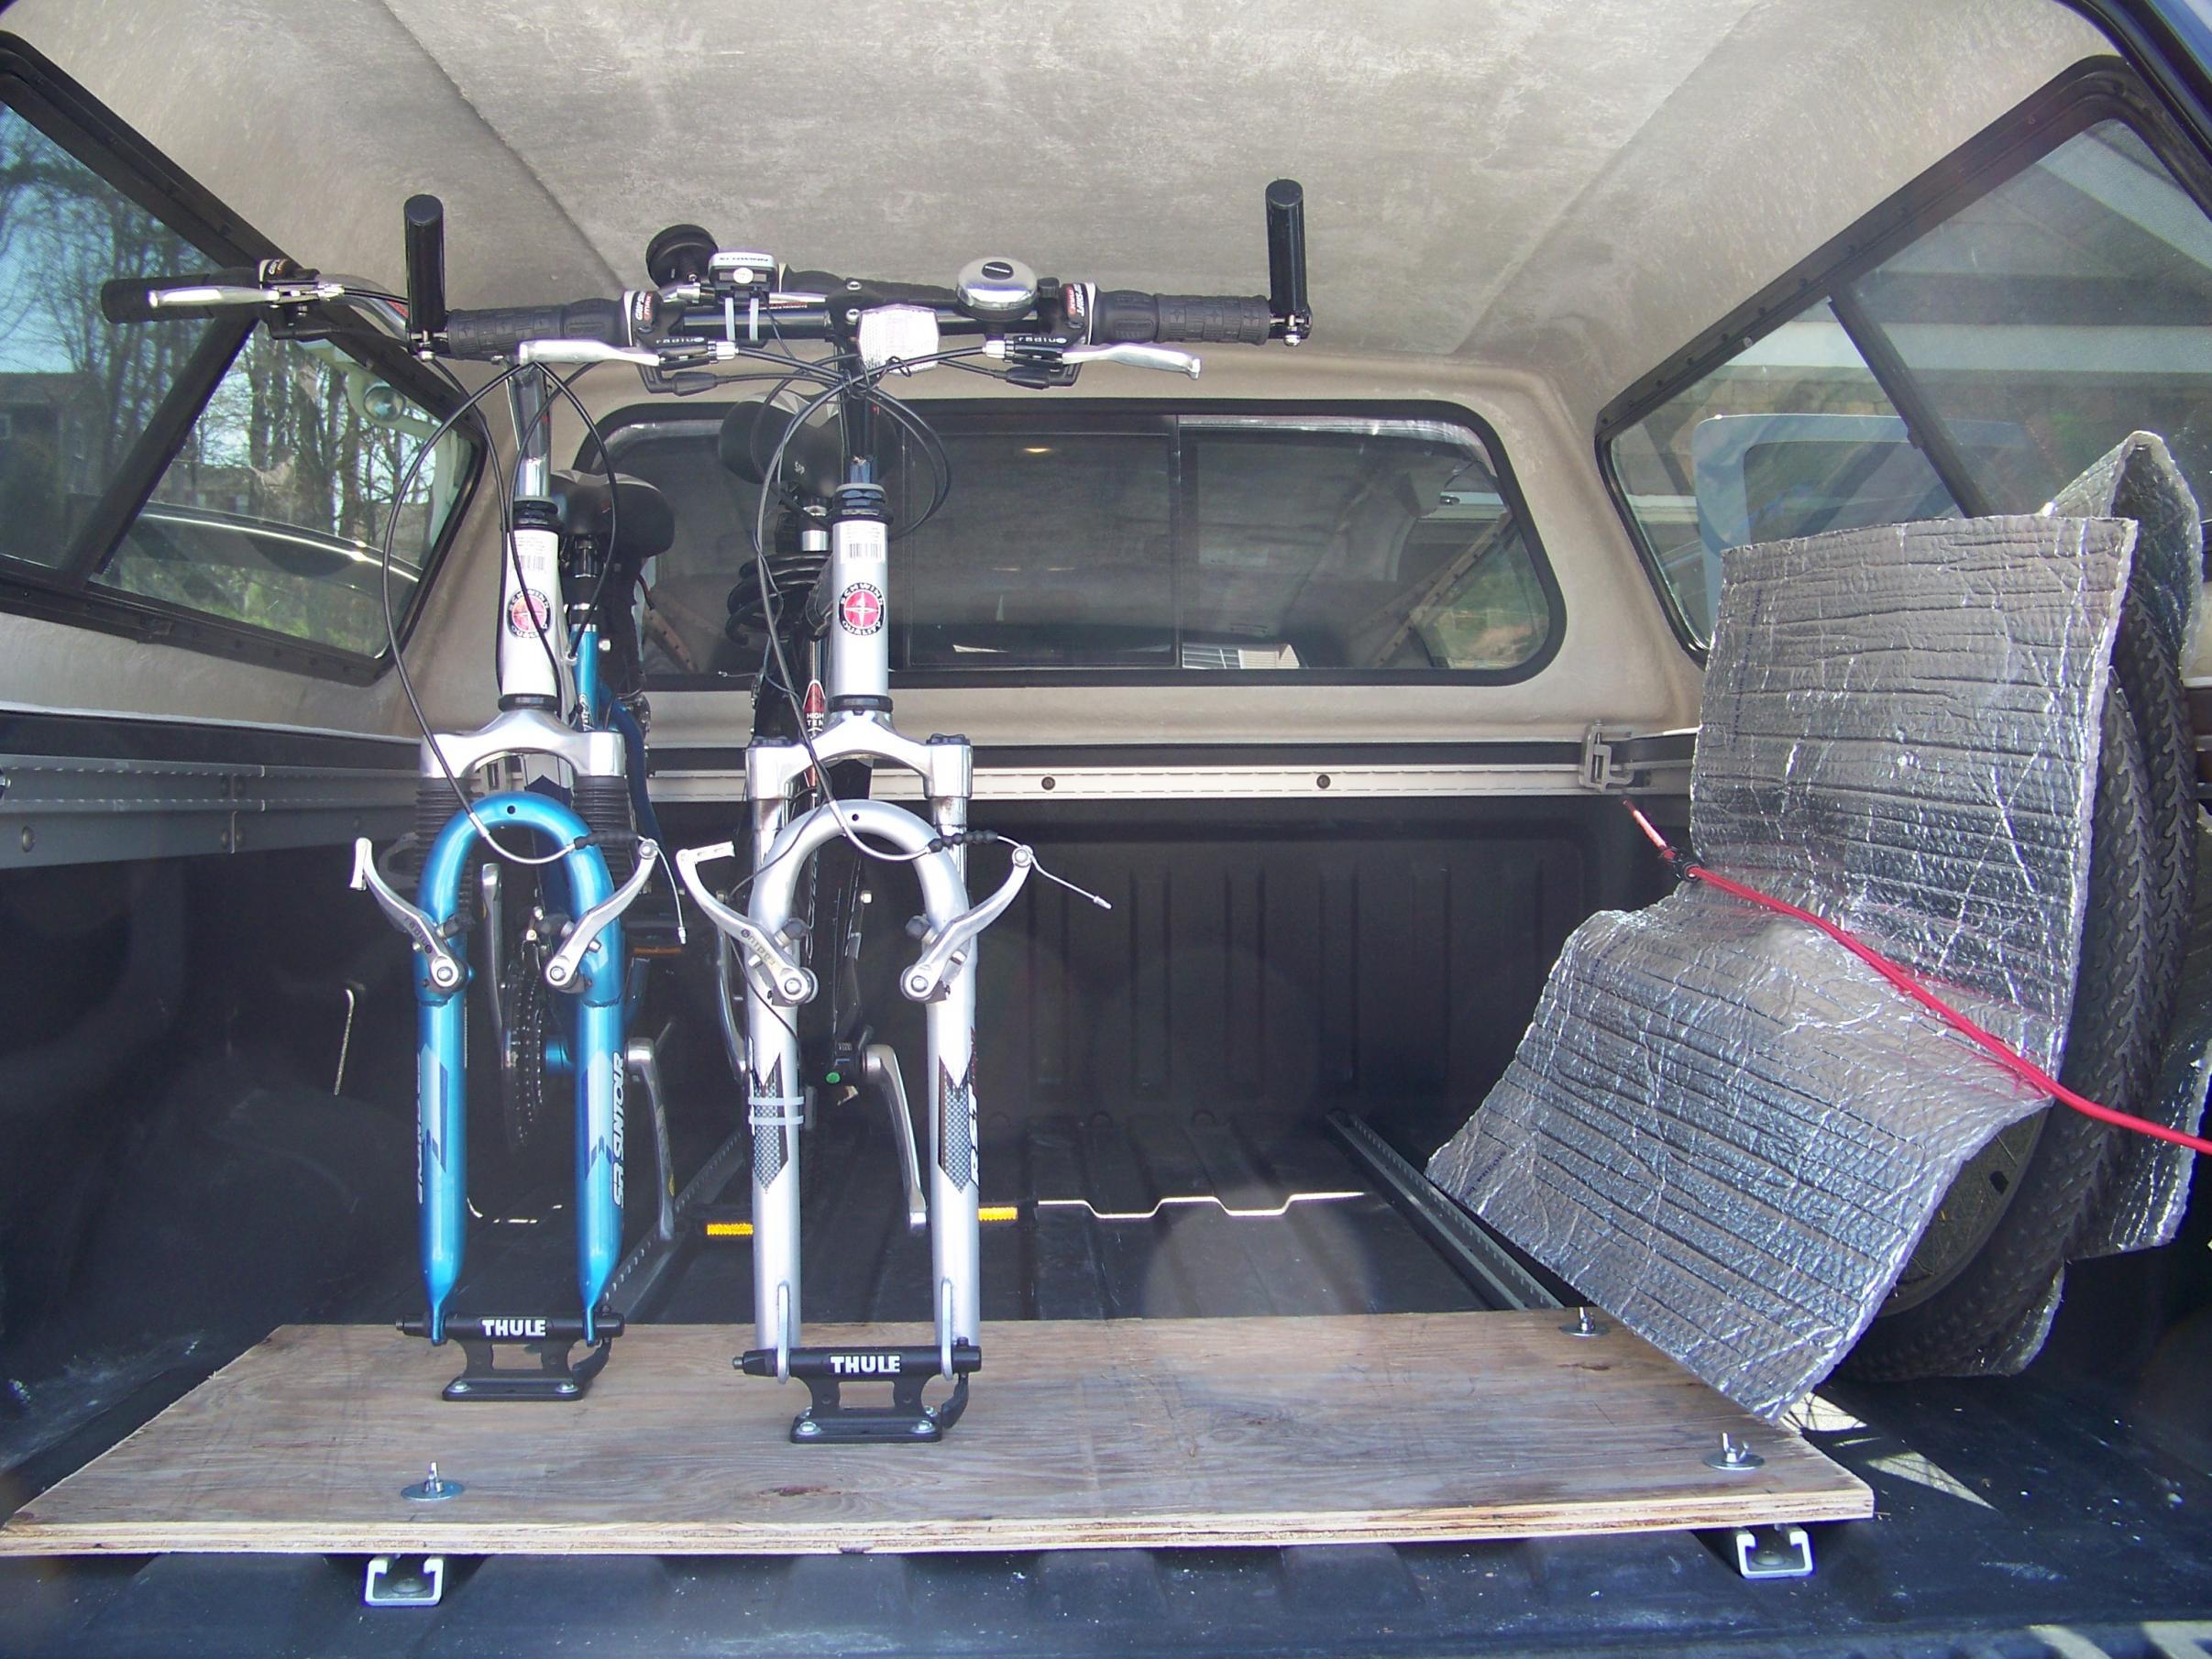 Diy Bike Rack For Less Than 30 Nissan Titan Forum